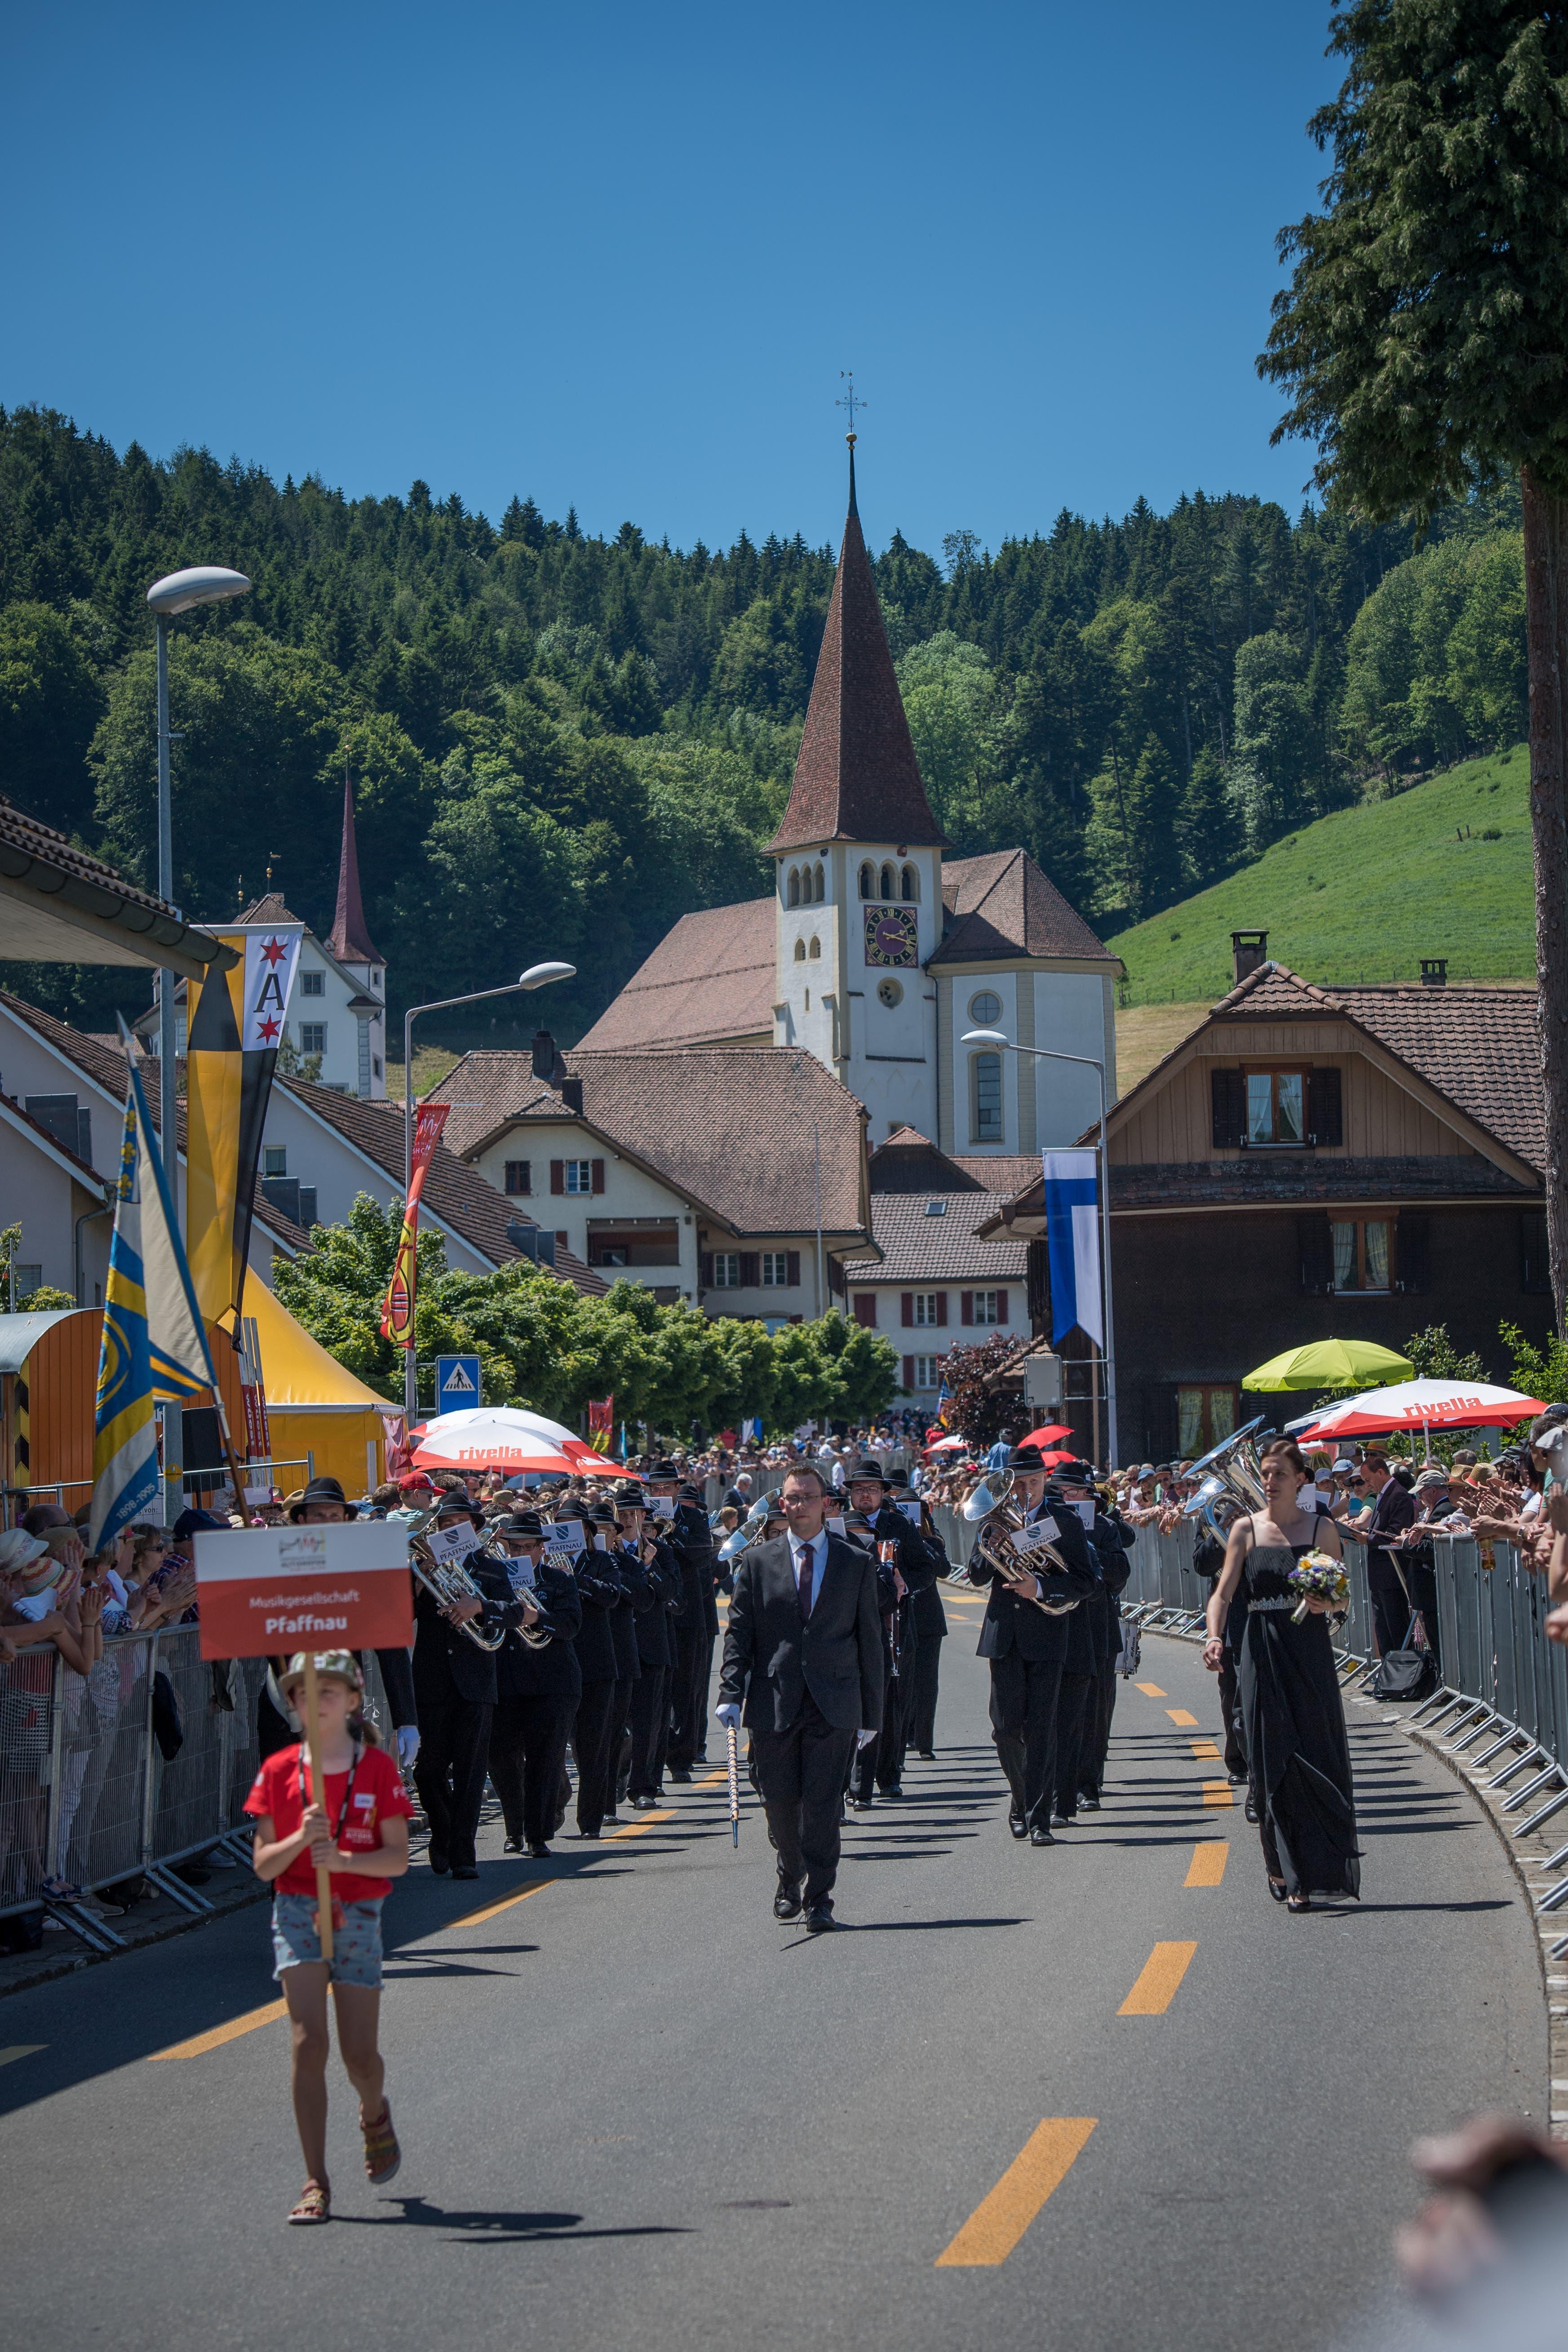 Die MG Pfaffnau am Kantonal-Musiktag. (Bild: Roger Grütter, Altishofen, 2. Juni 2019)